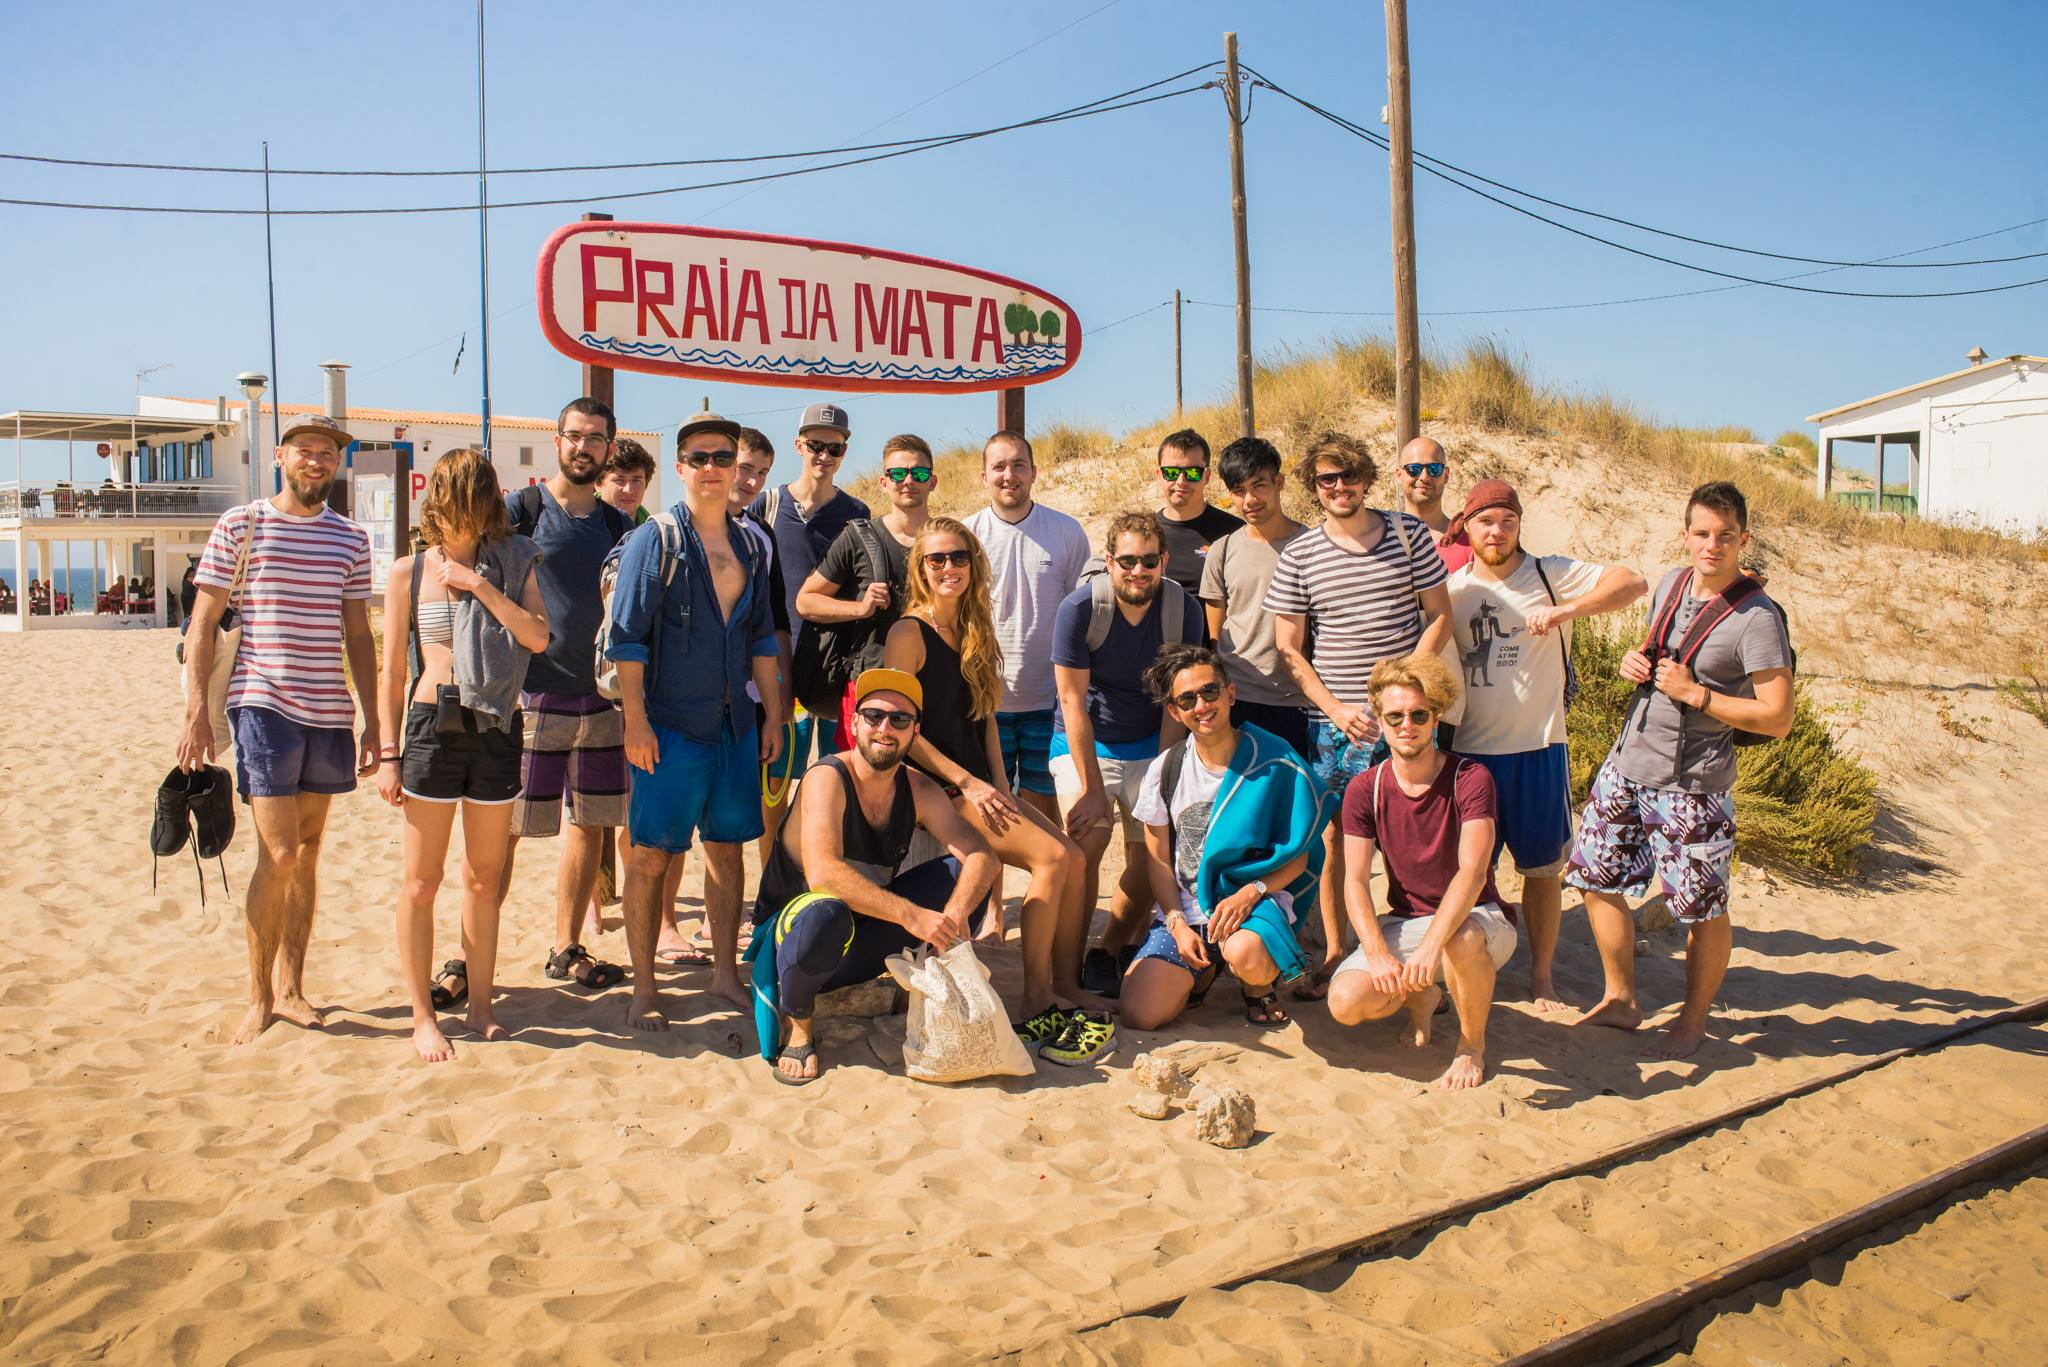 Team building activities - Praia da Mata, Lisbon